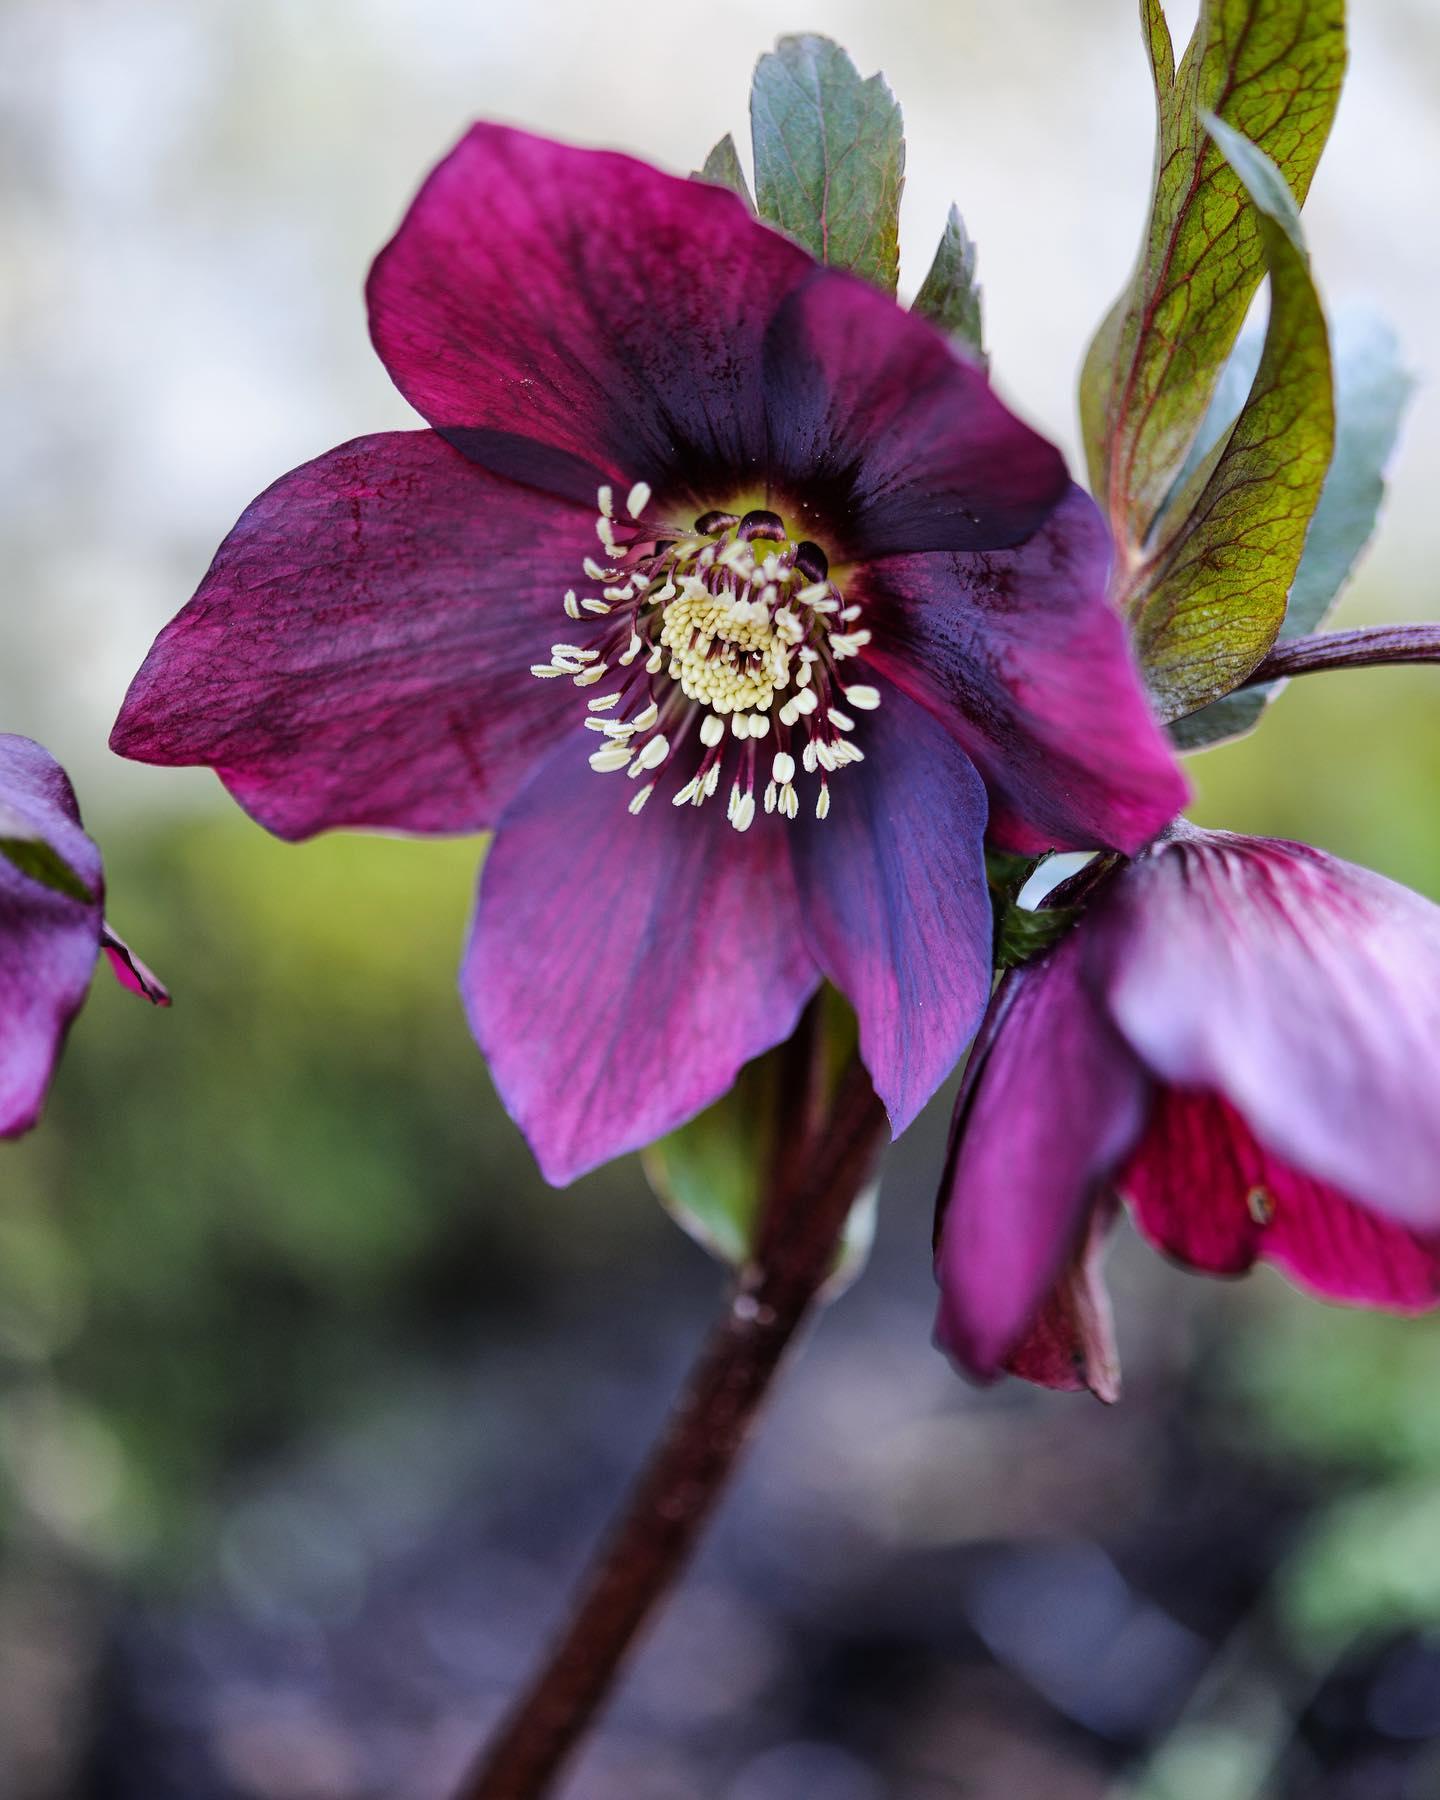 Helleborus × hybridus 'Harvington Shades of the Night'...#hellebore #helleborus #helleborusxhybridus #winterplants #gardenphotography #gardenphotographer #plantphotography #plantphotographer #nikonphotography #nikon #nikonuk